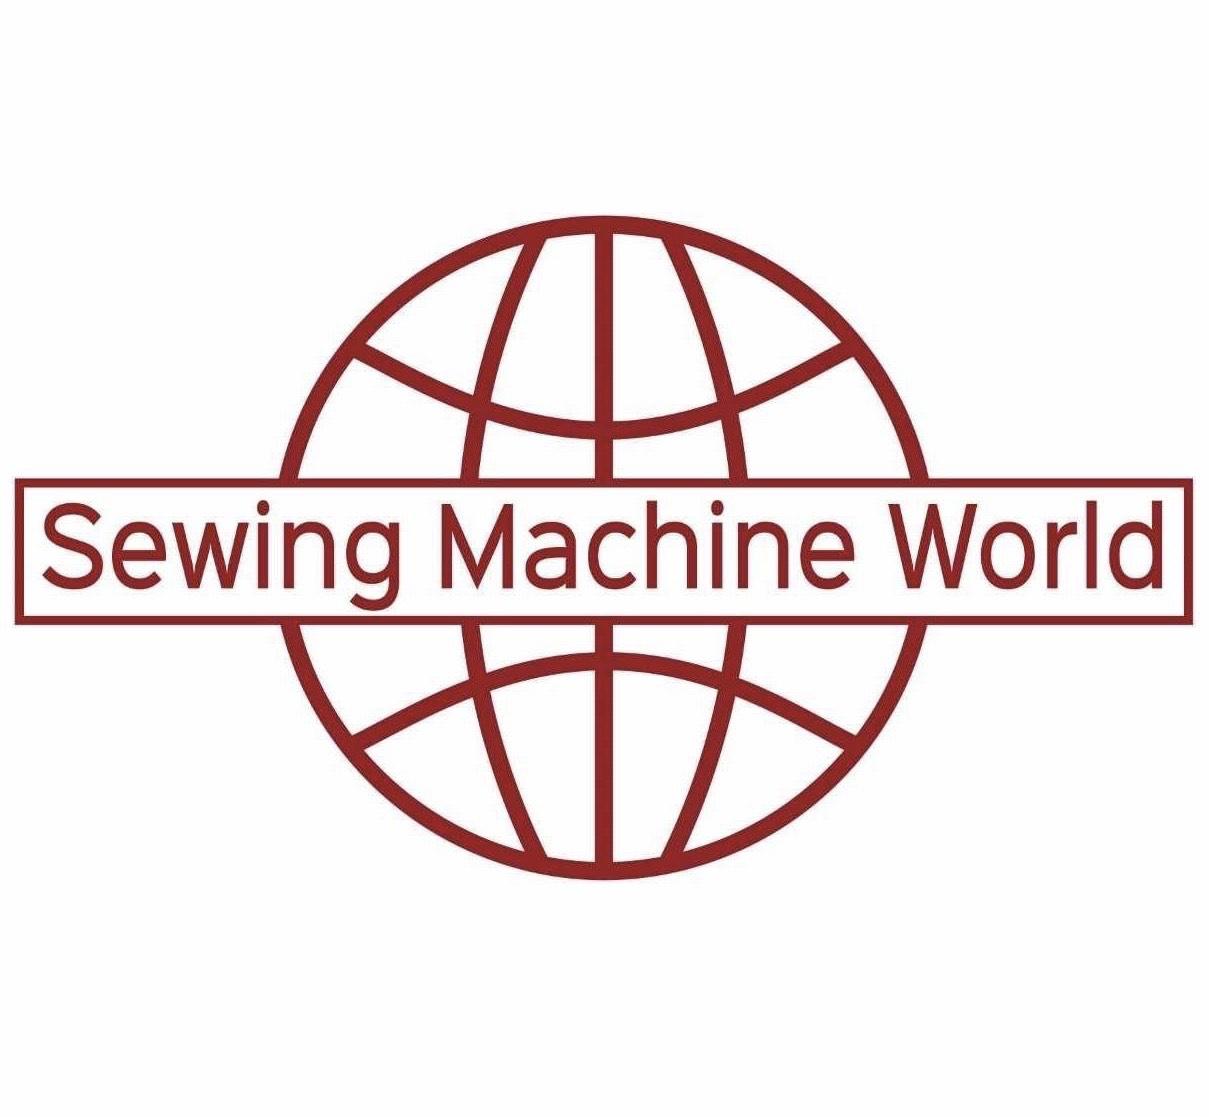 Sewing Machine World Logo